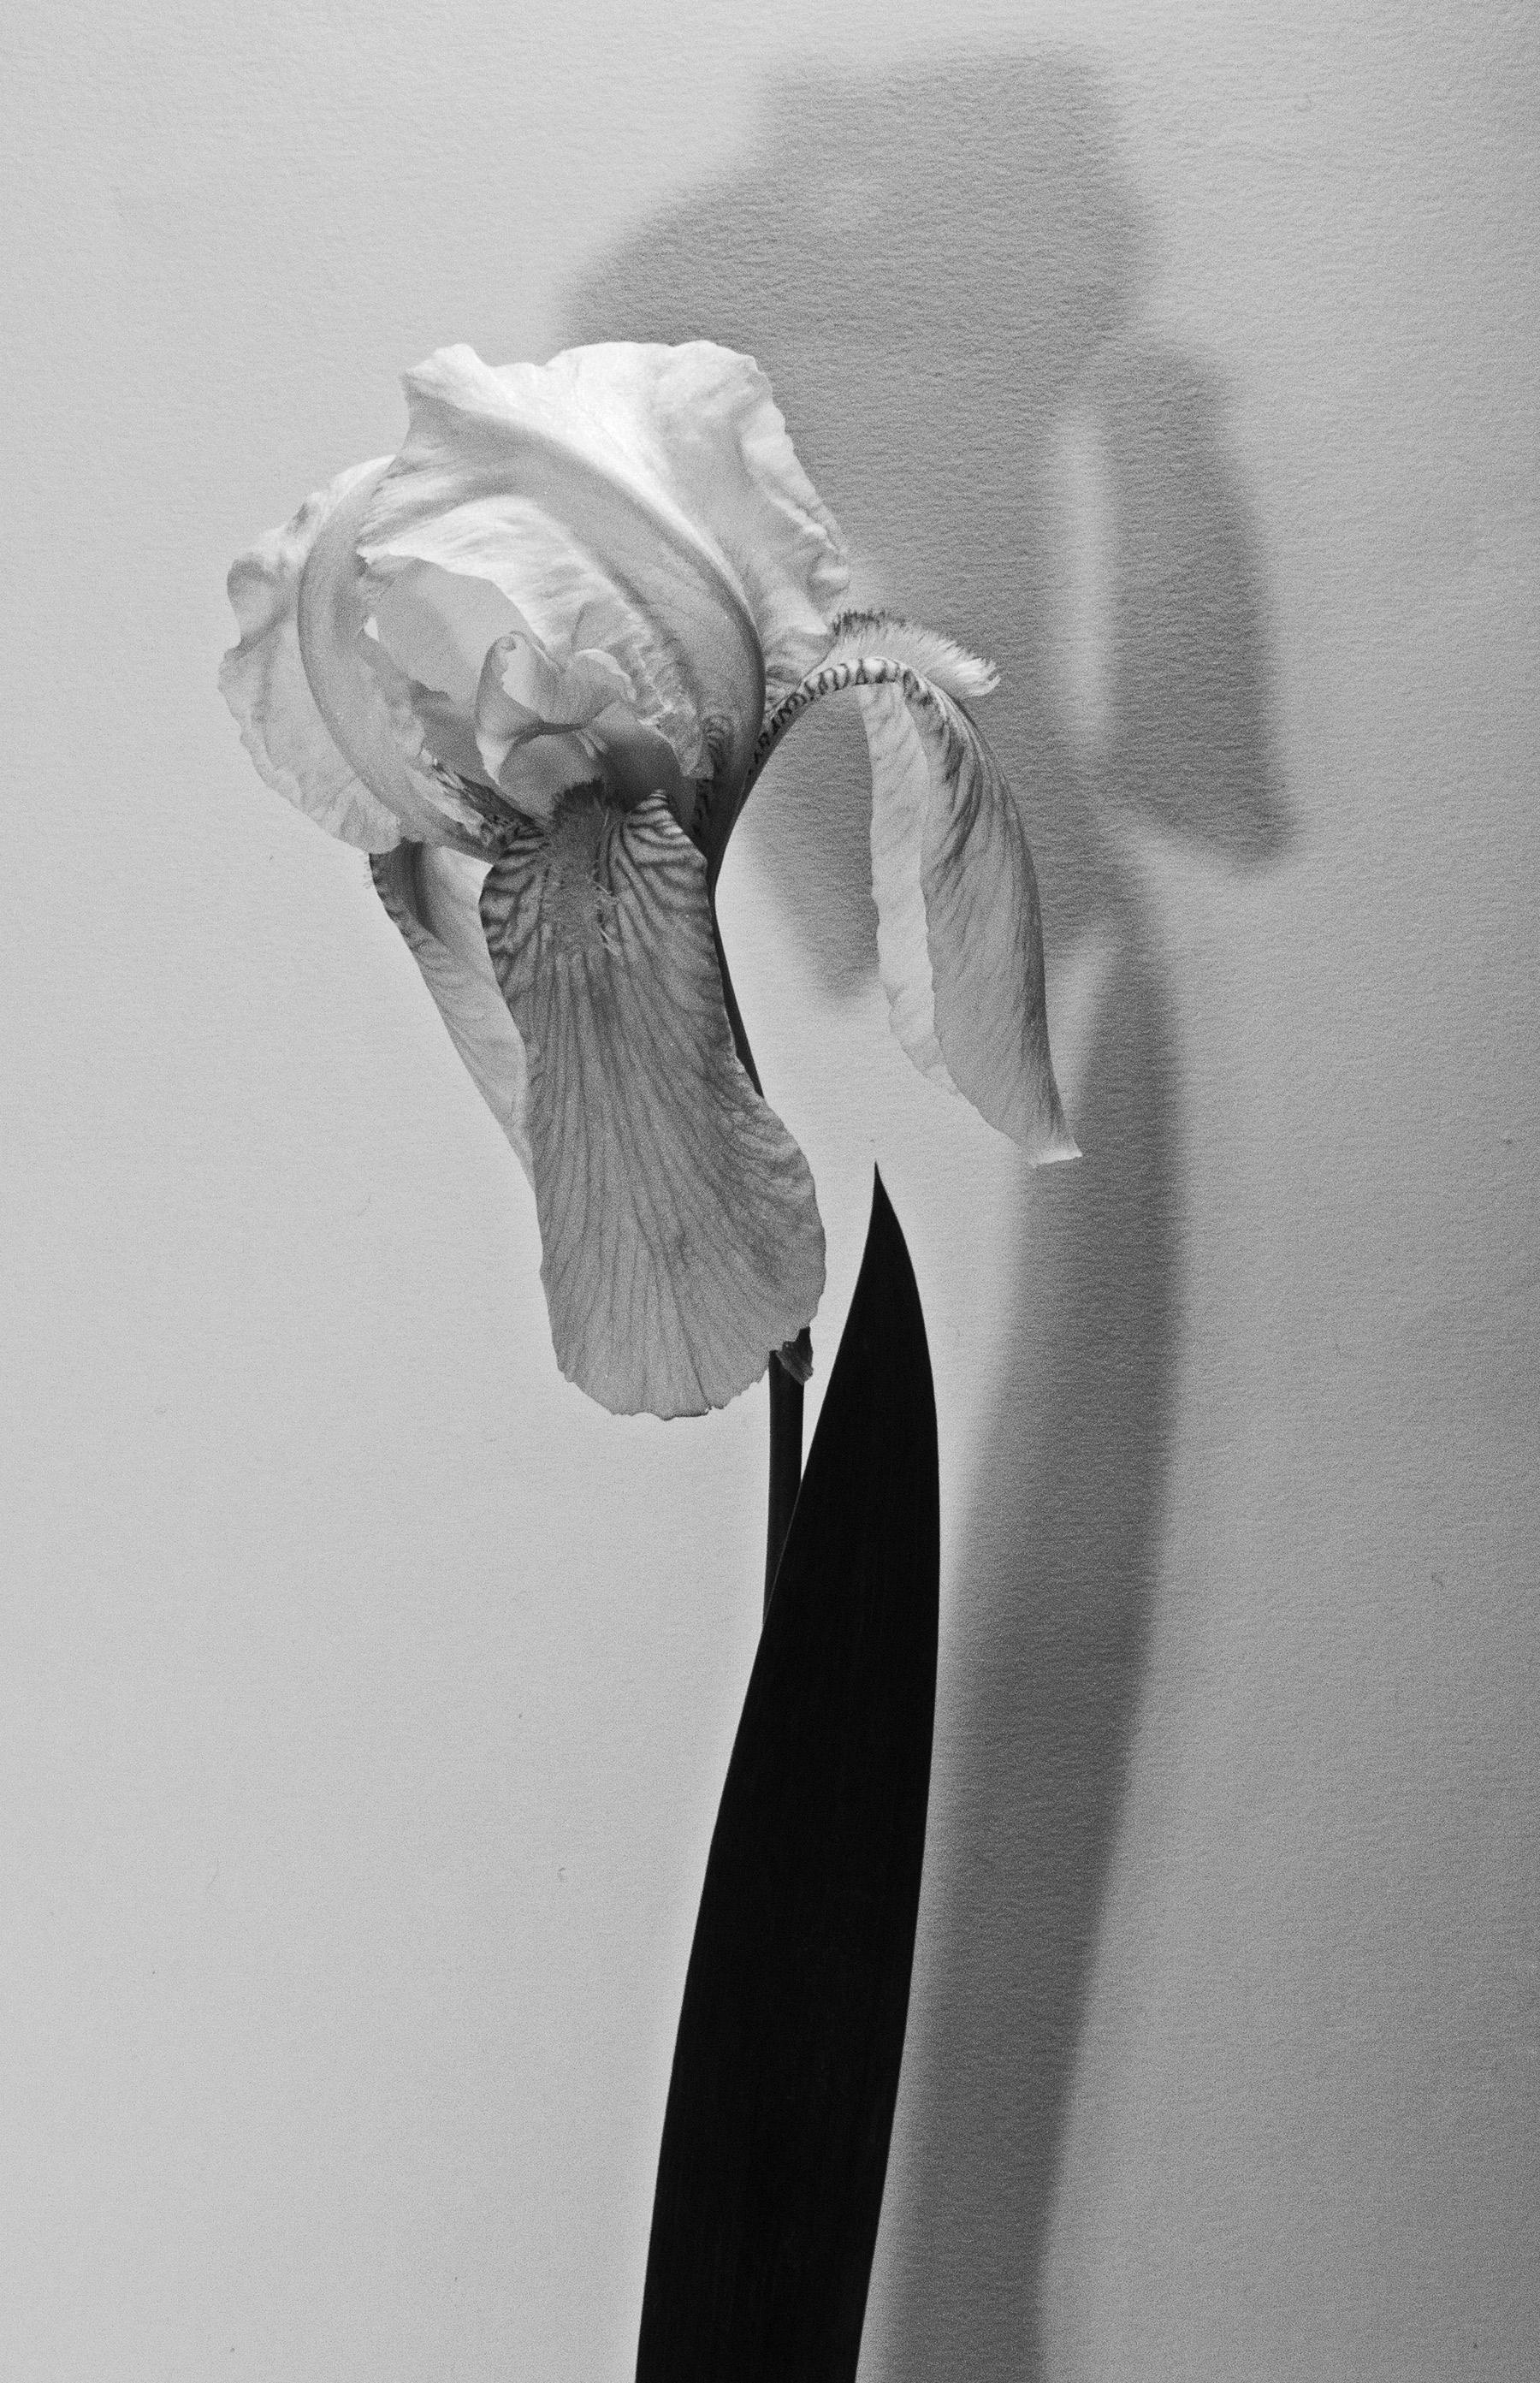 Carol-Lawrence-One-Shadow-Floretina-5-16-2.jpg